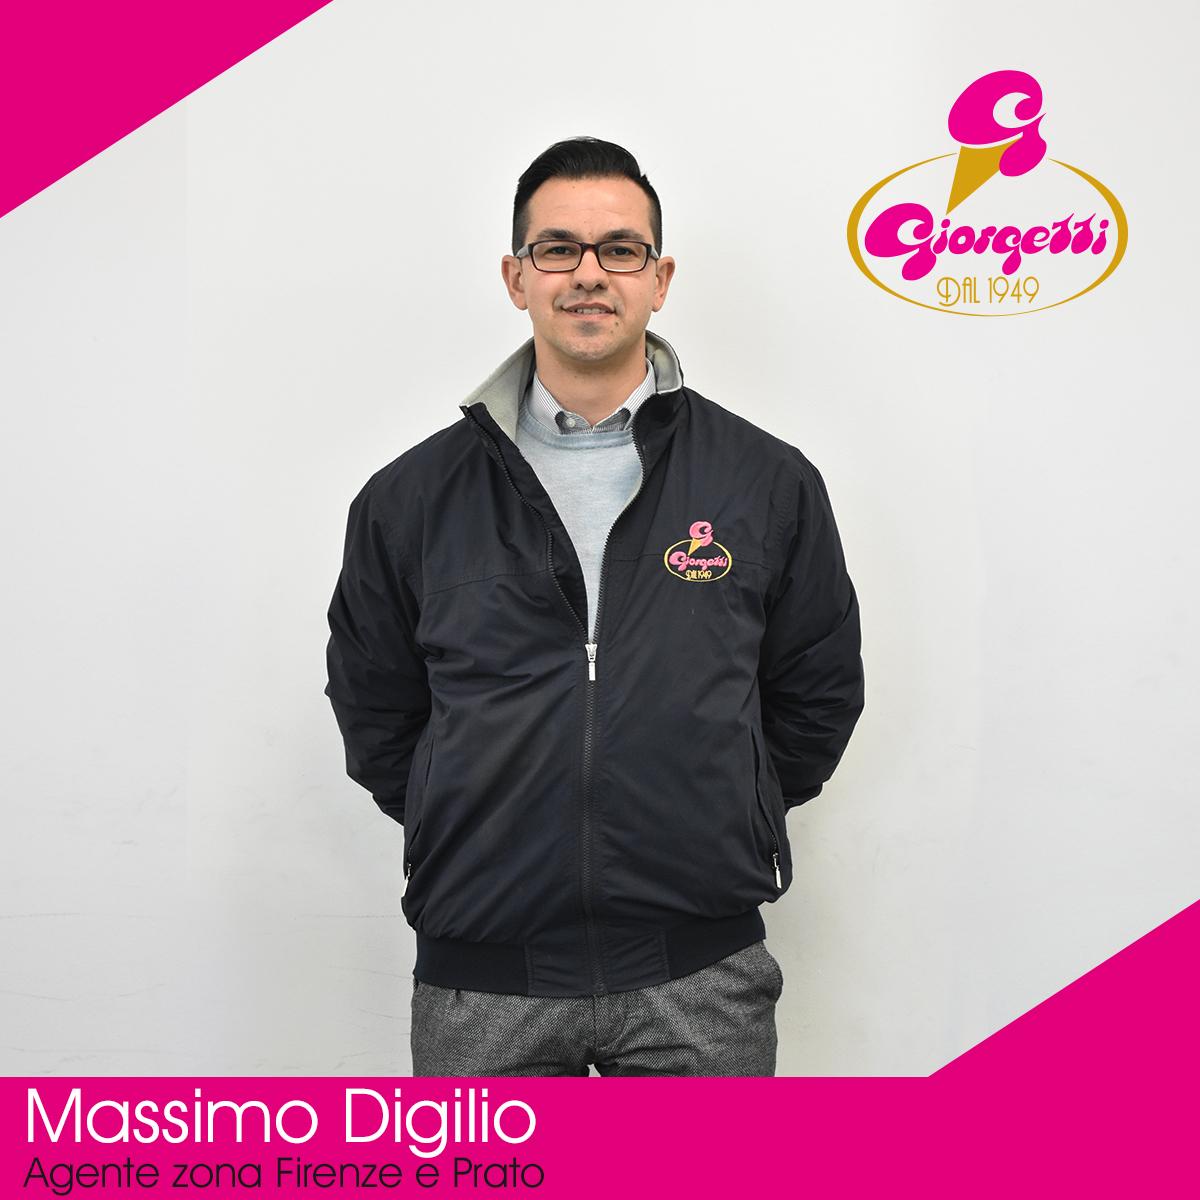 Massimo Digilio